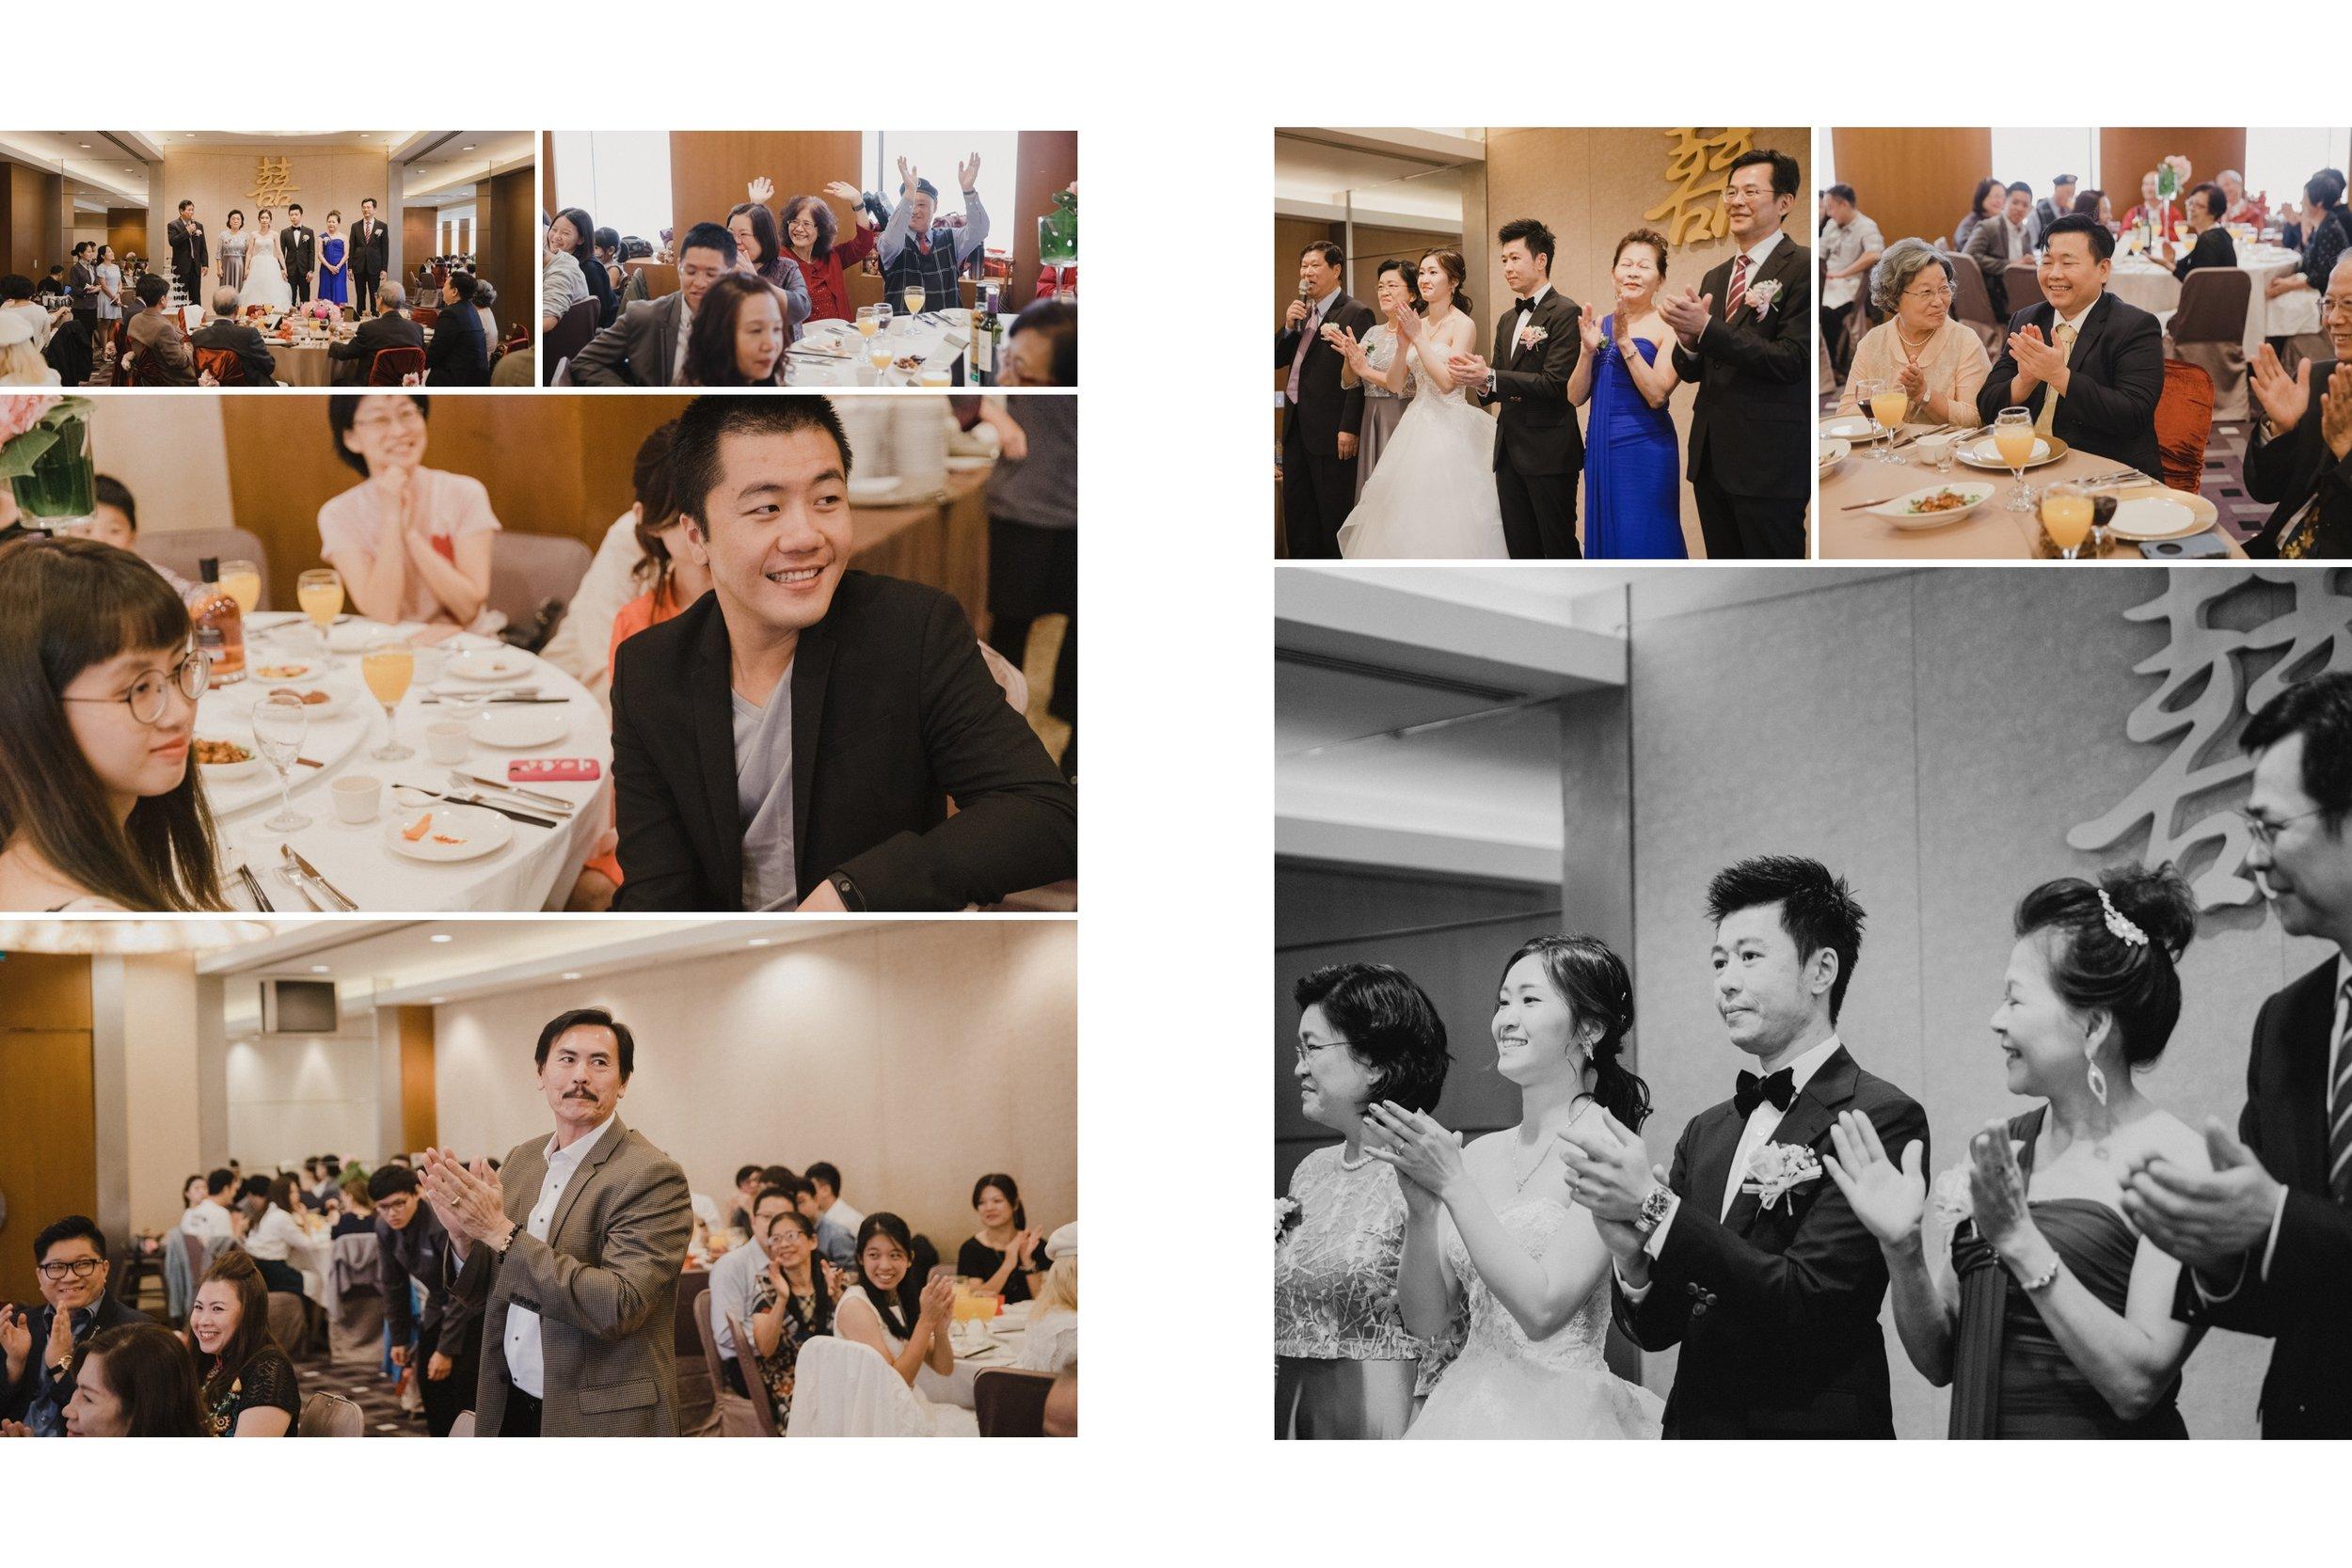 wedding-caridee-oscar-lunch-ambassador-hsinchu-結婚午宴-新竹國賓_87.jpg